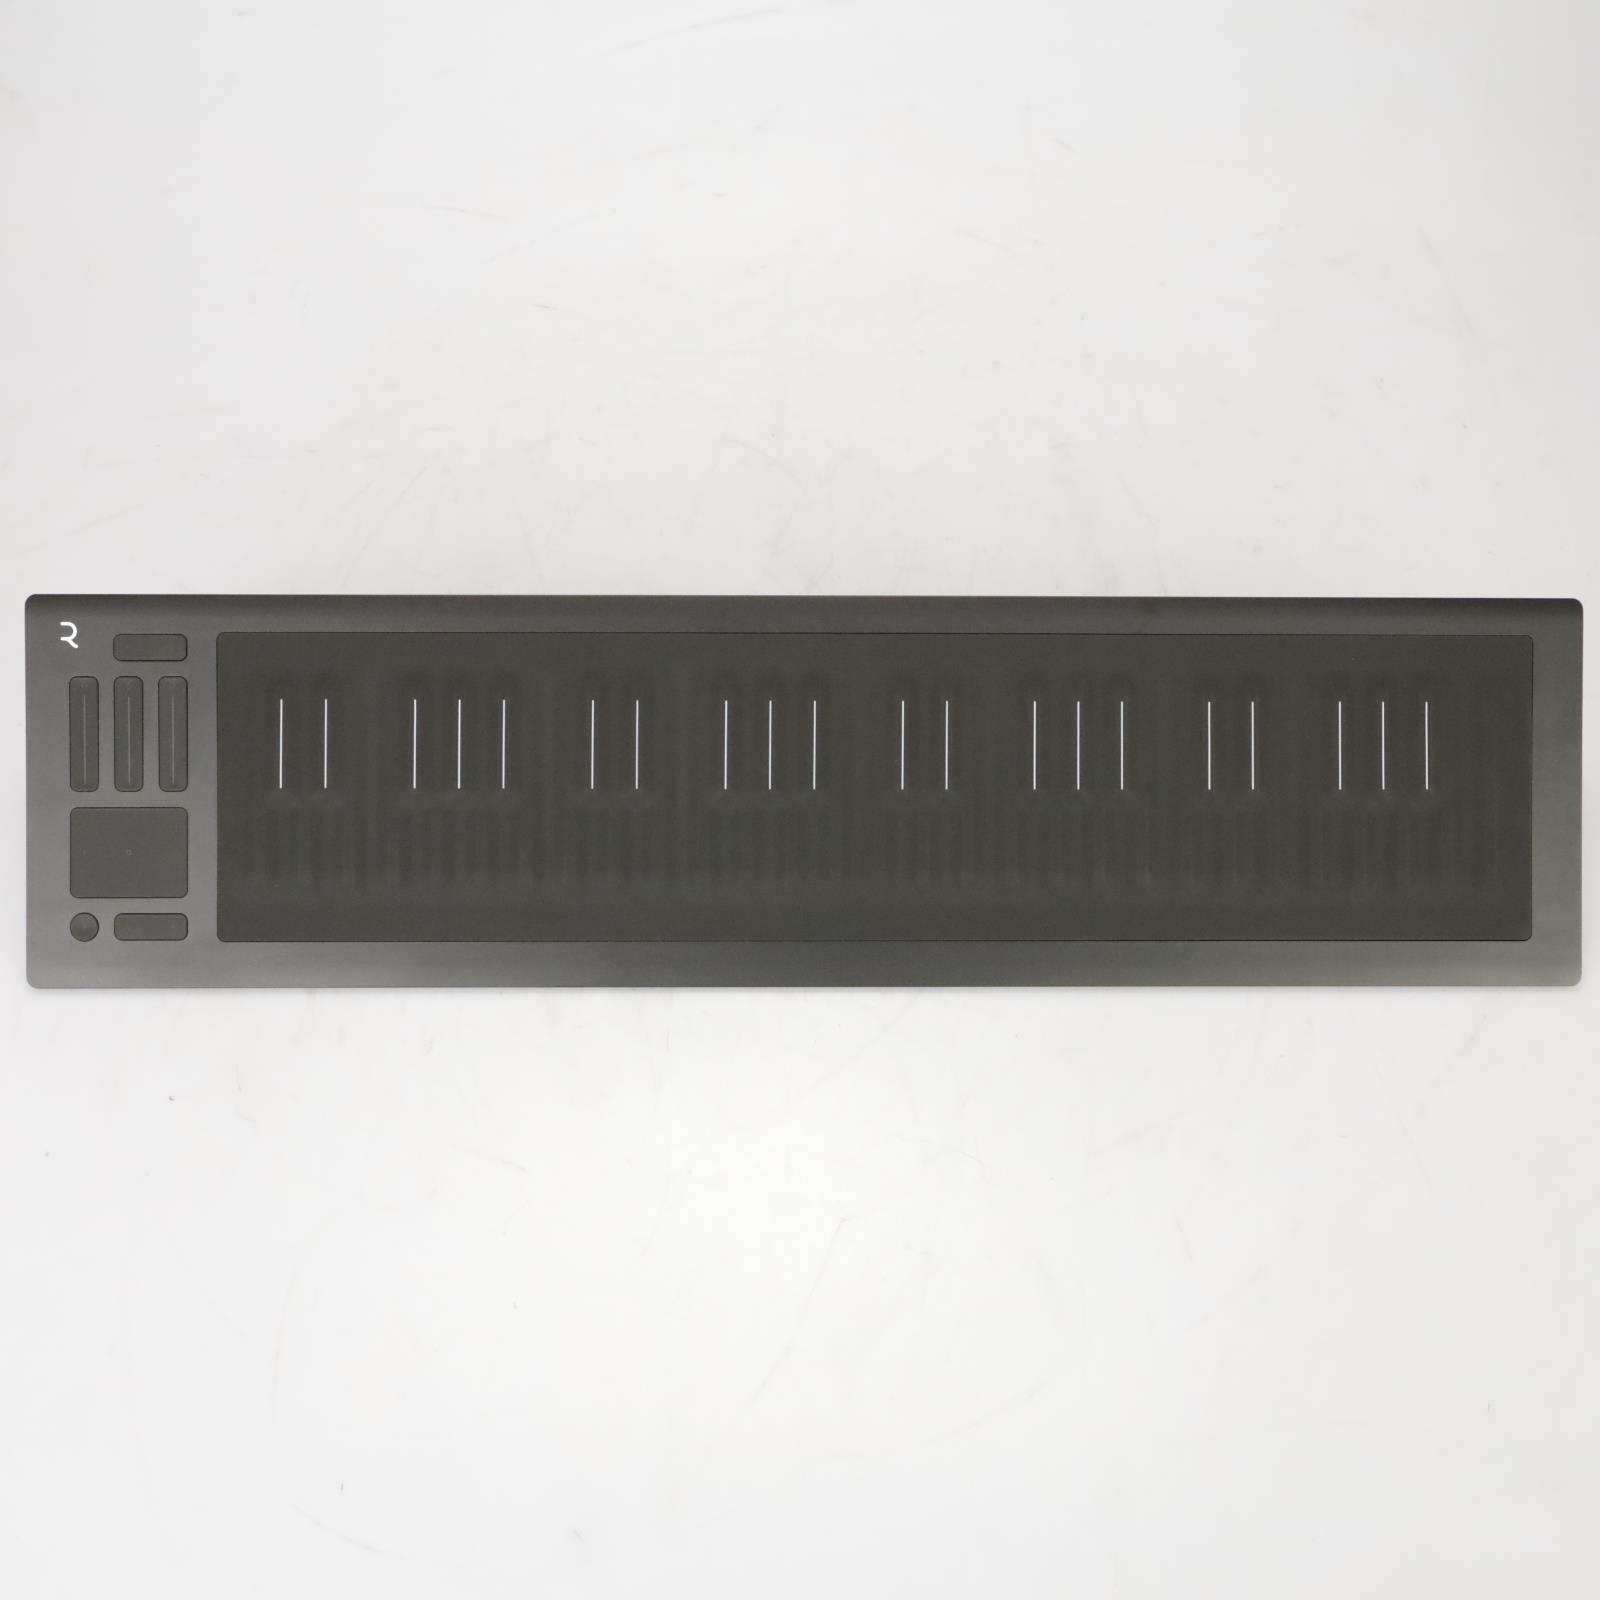 ROLI Seaboard Rise 49 MIDI Controller Keyboard w/ Case #38079